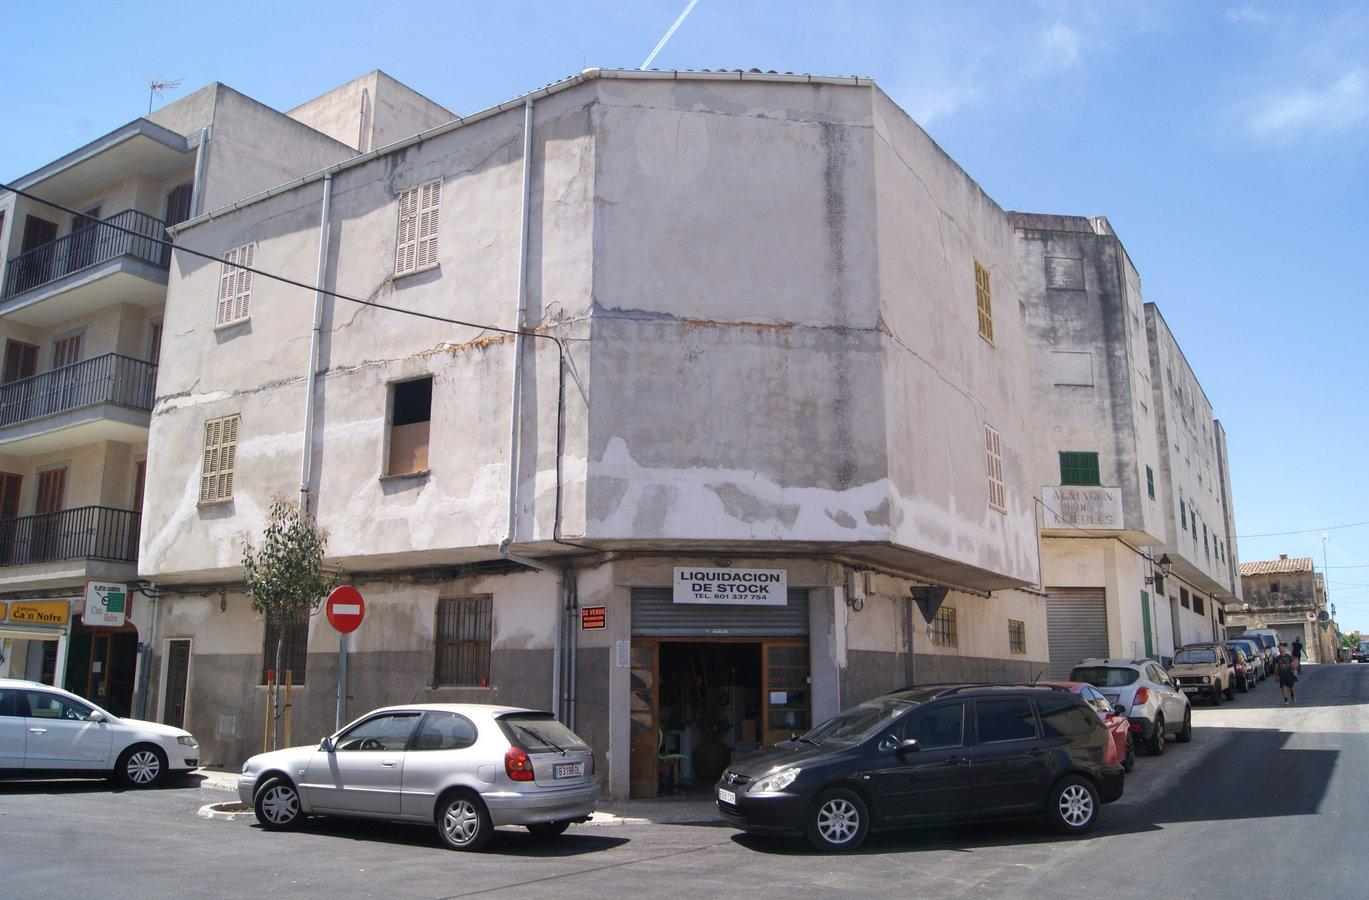 Building  Calle carrer de sa fàbrica, 18. Excelente edificio de 3 plantas en buen estado de conservación,